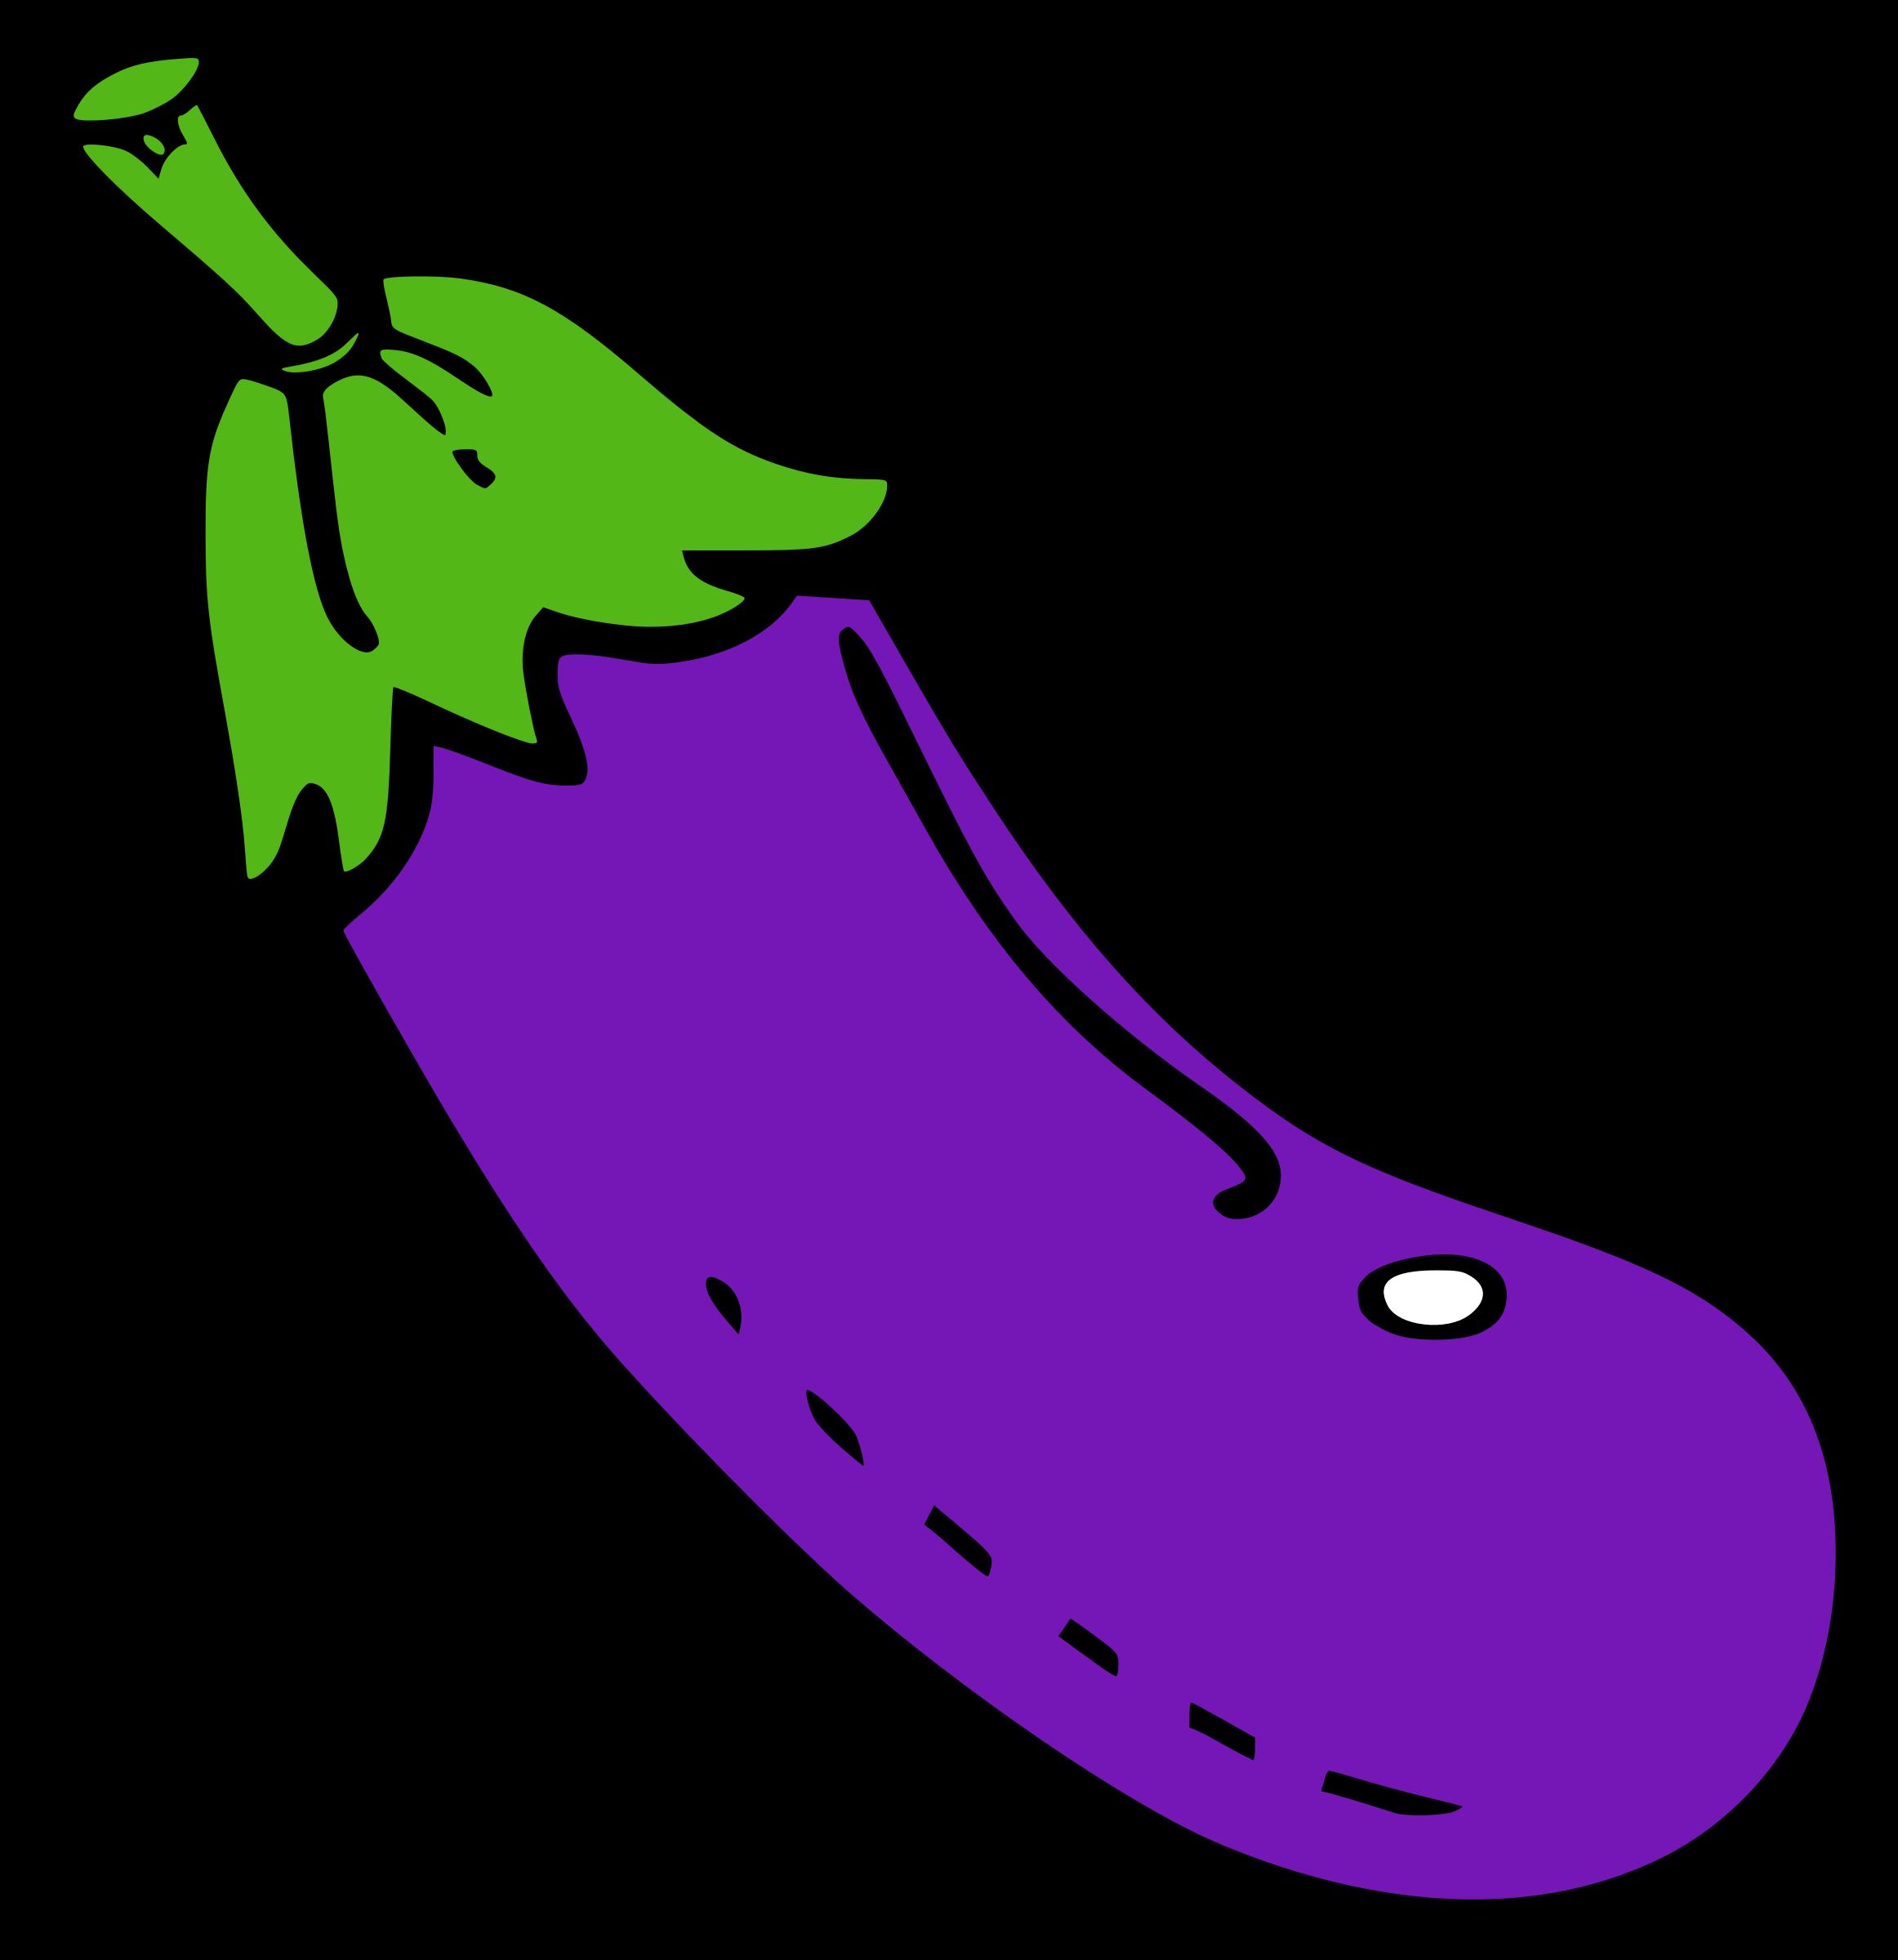 image free Big image png. Eggplant clipart.